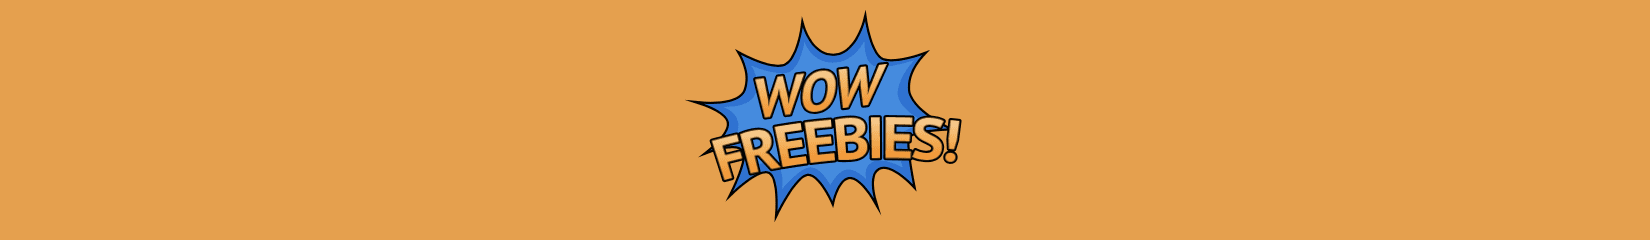 WOW Freebies new design banner